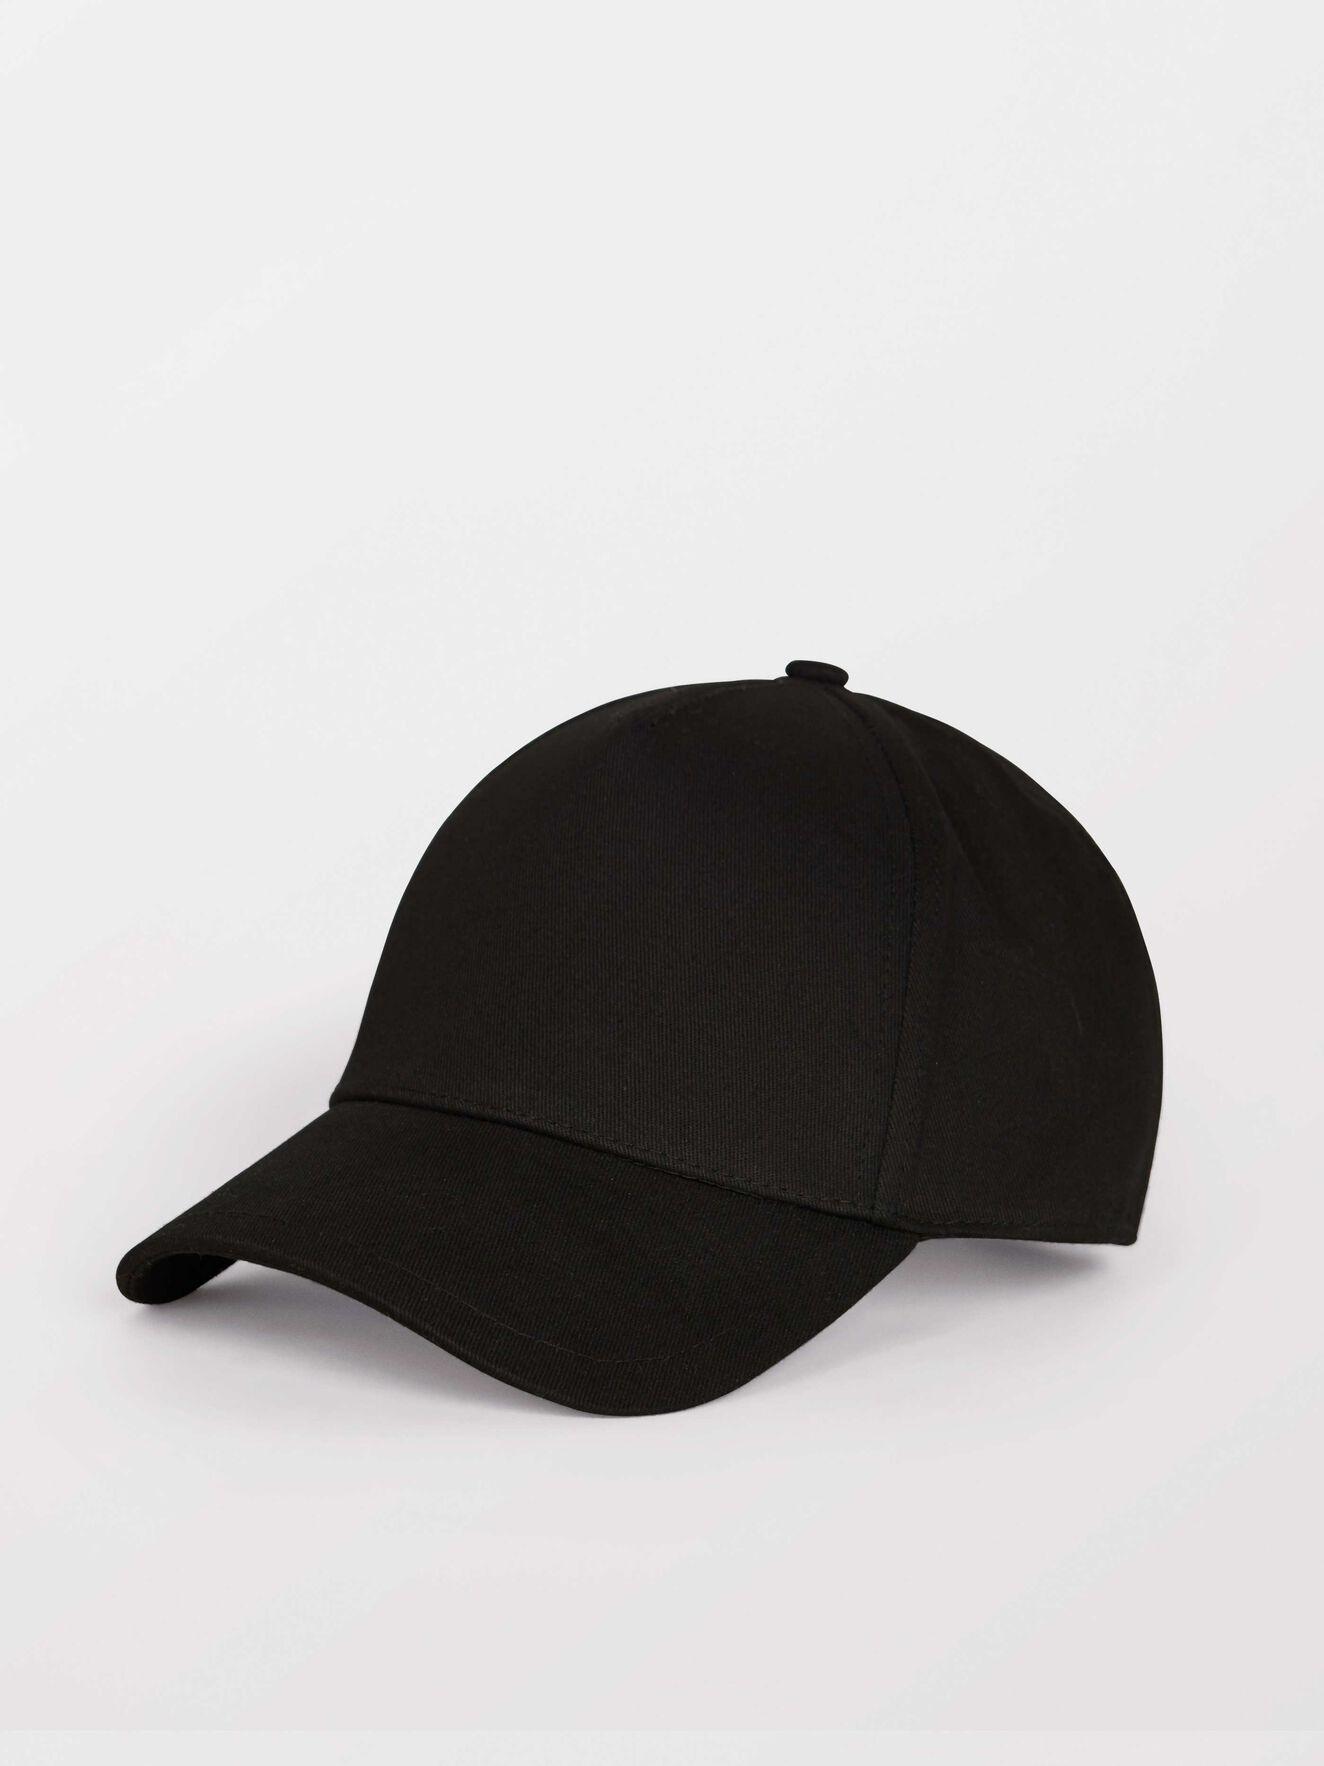 Hinsdal 2 L Cap in Black from Tiger of Sweden